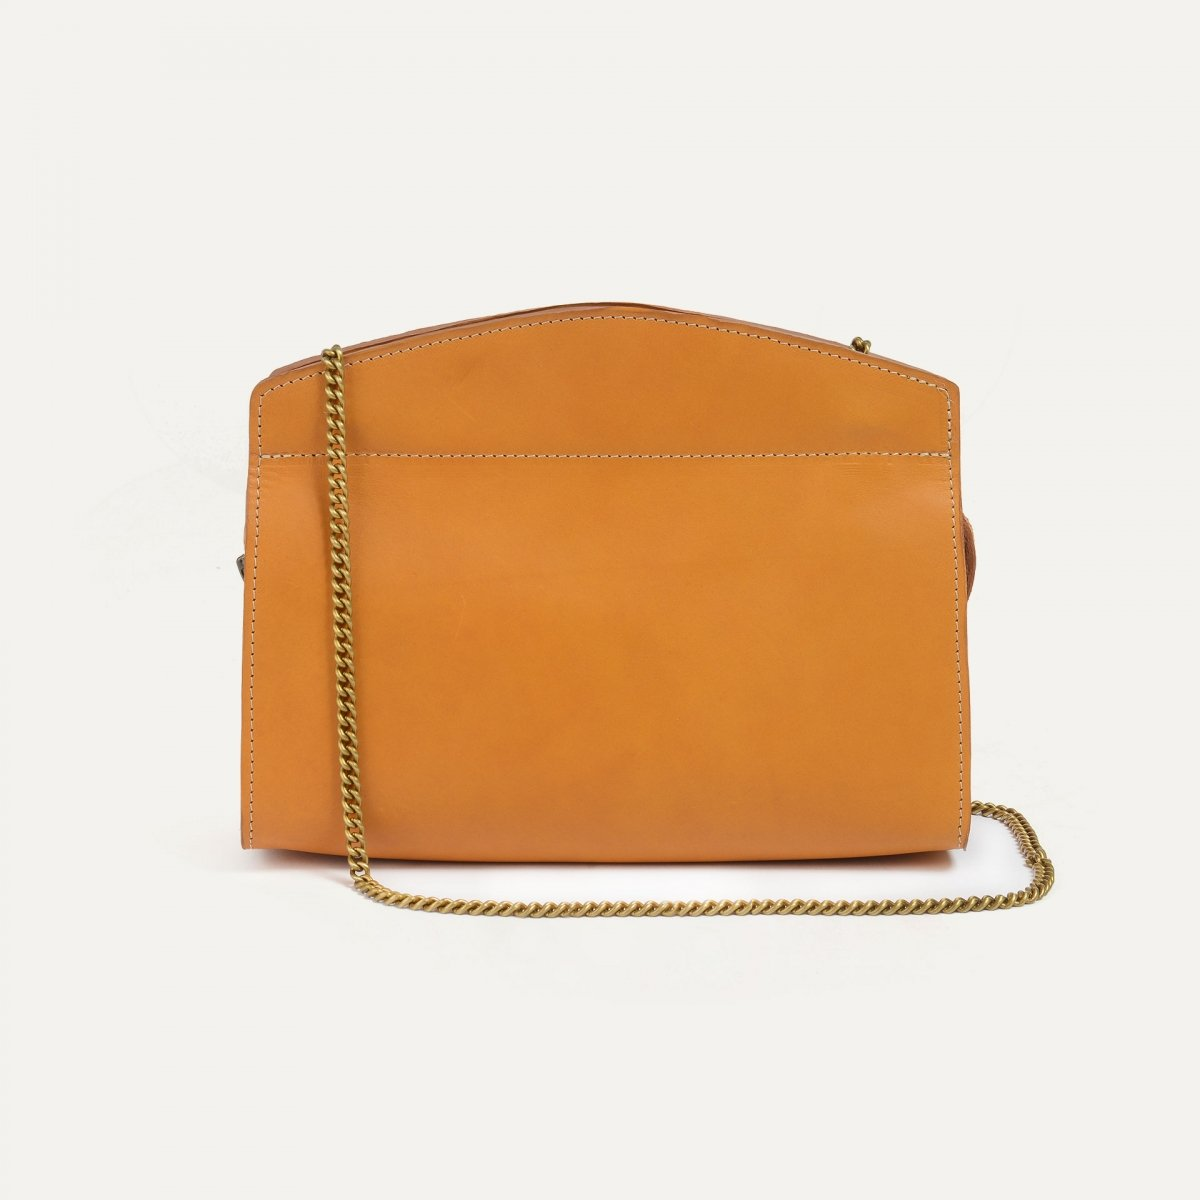 Origami S Zipped clutch bag - Honey (image n°3)